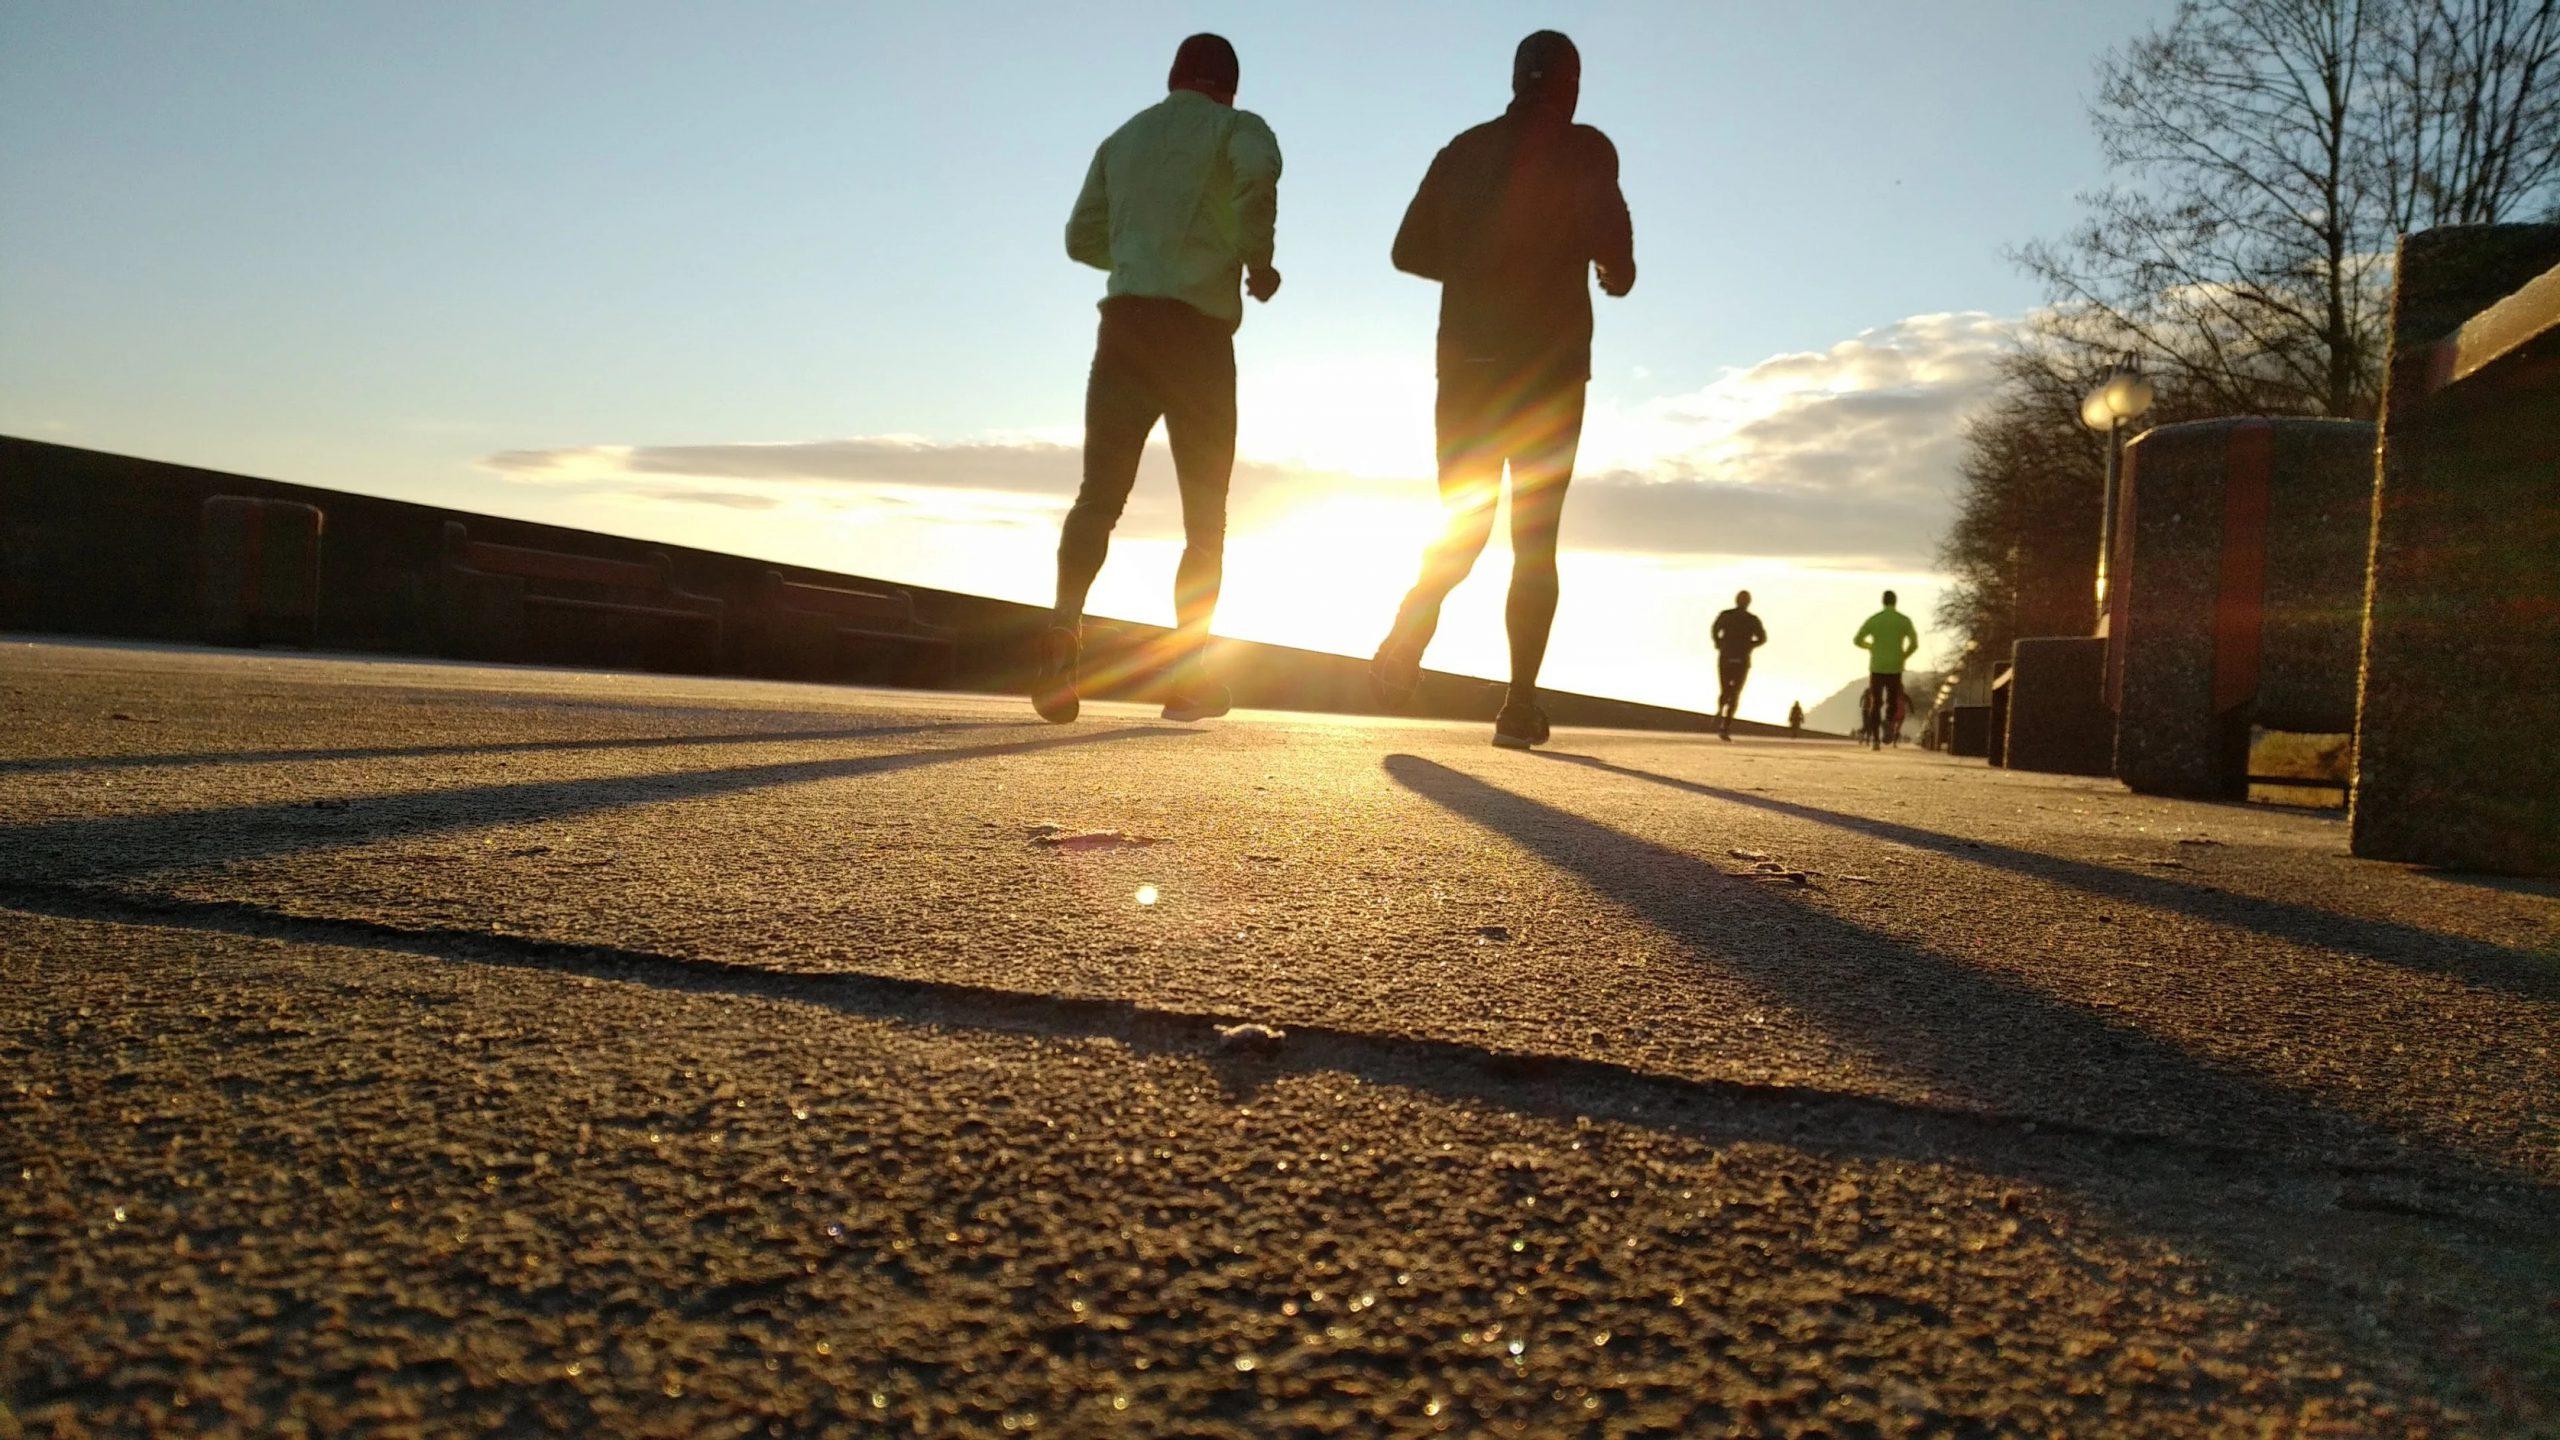 The Realities of Running